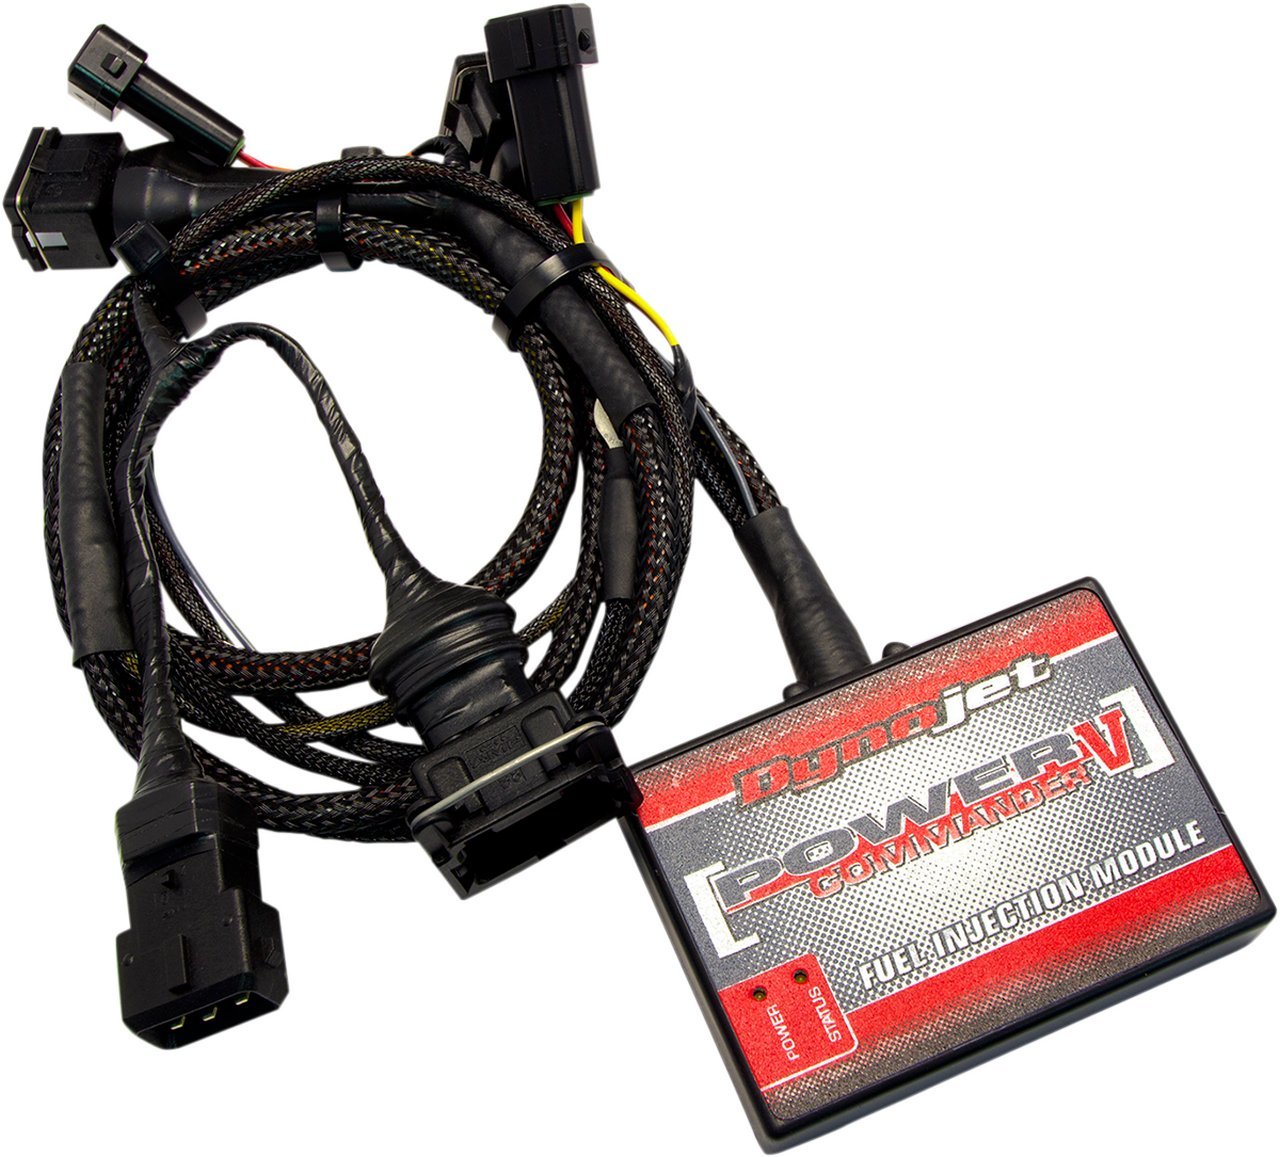 【MOOSE RACING】POWER COMMANDER V 供油電腦 供油電腦 [1020-2397] - 「Webike-摩托百貨」